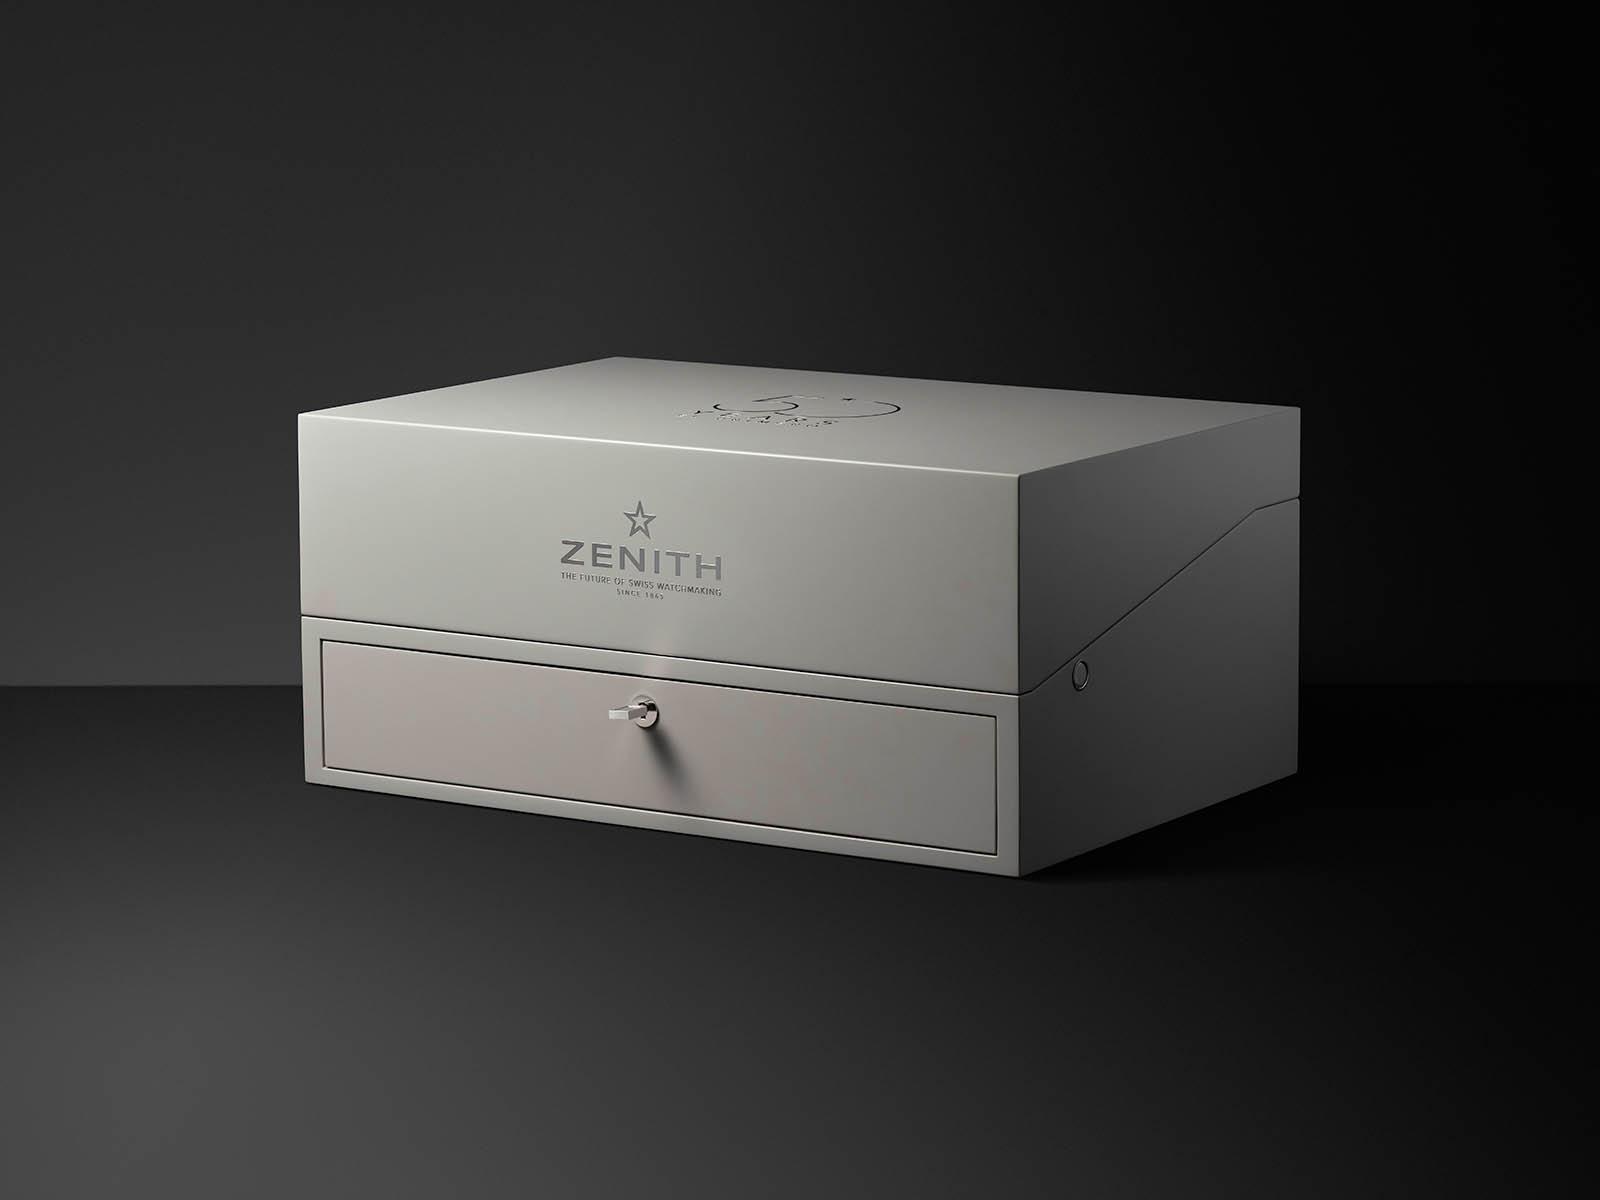 zenith-50-years-of-el-primero-anniversary-set-5.jpg